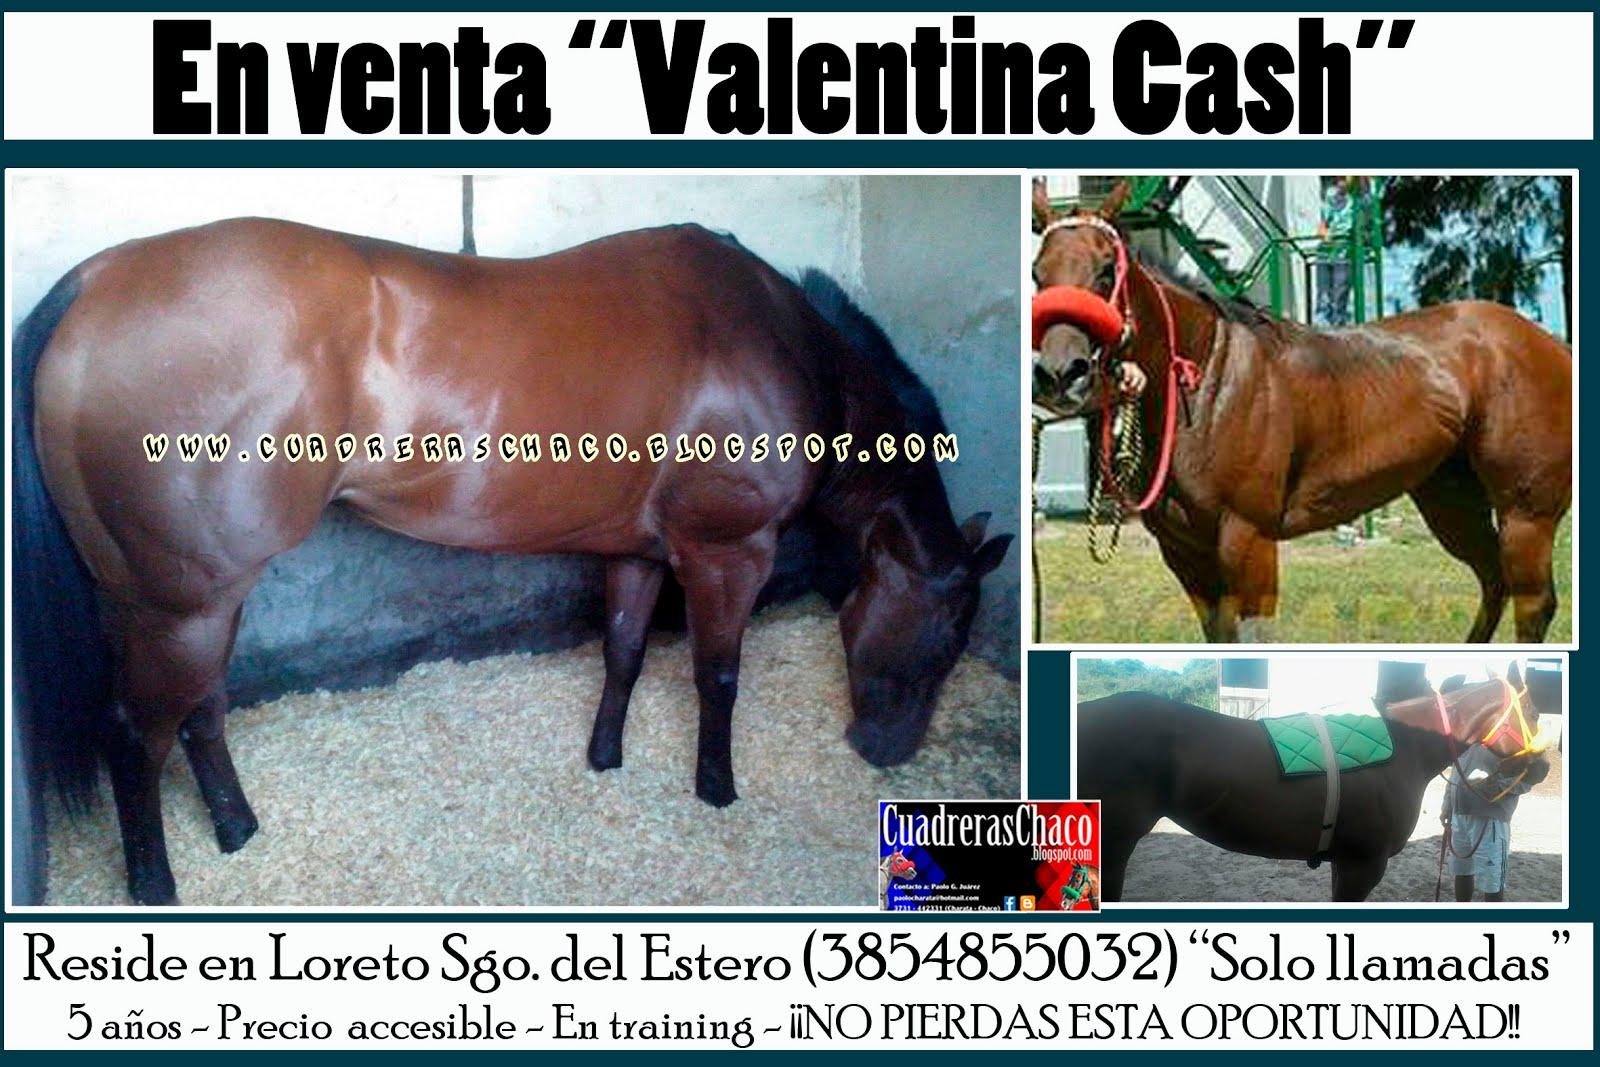 VNTA VALENTINA 16-2-17